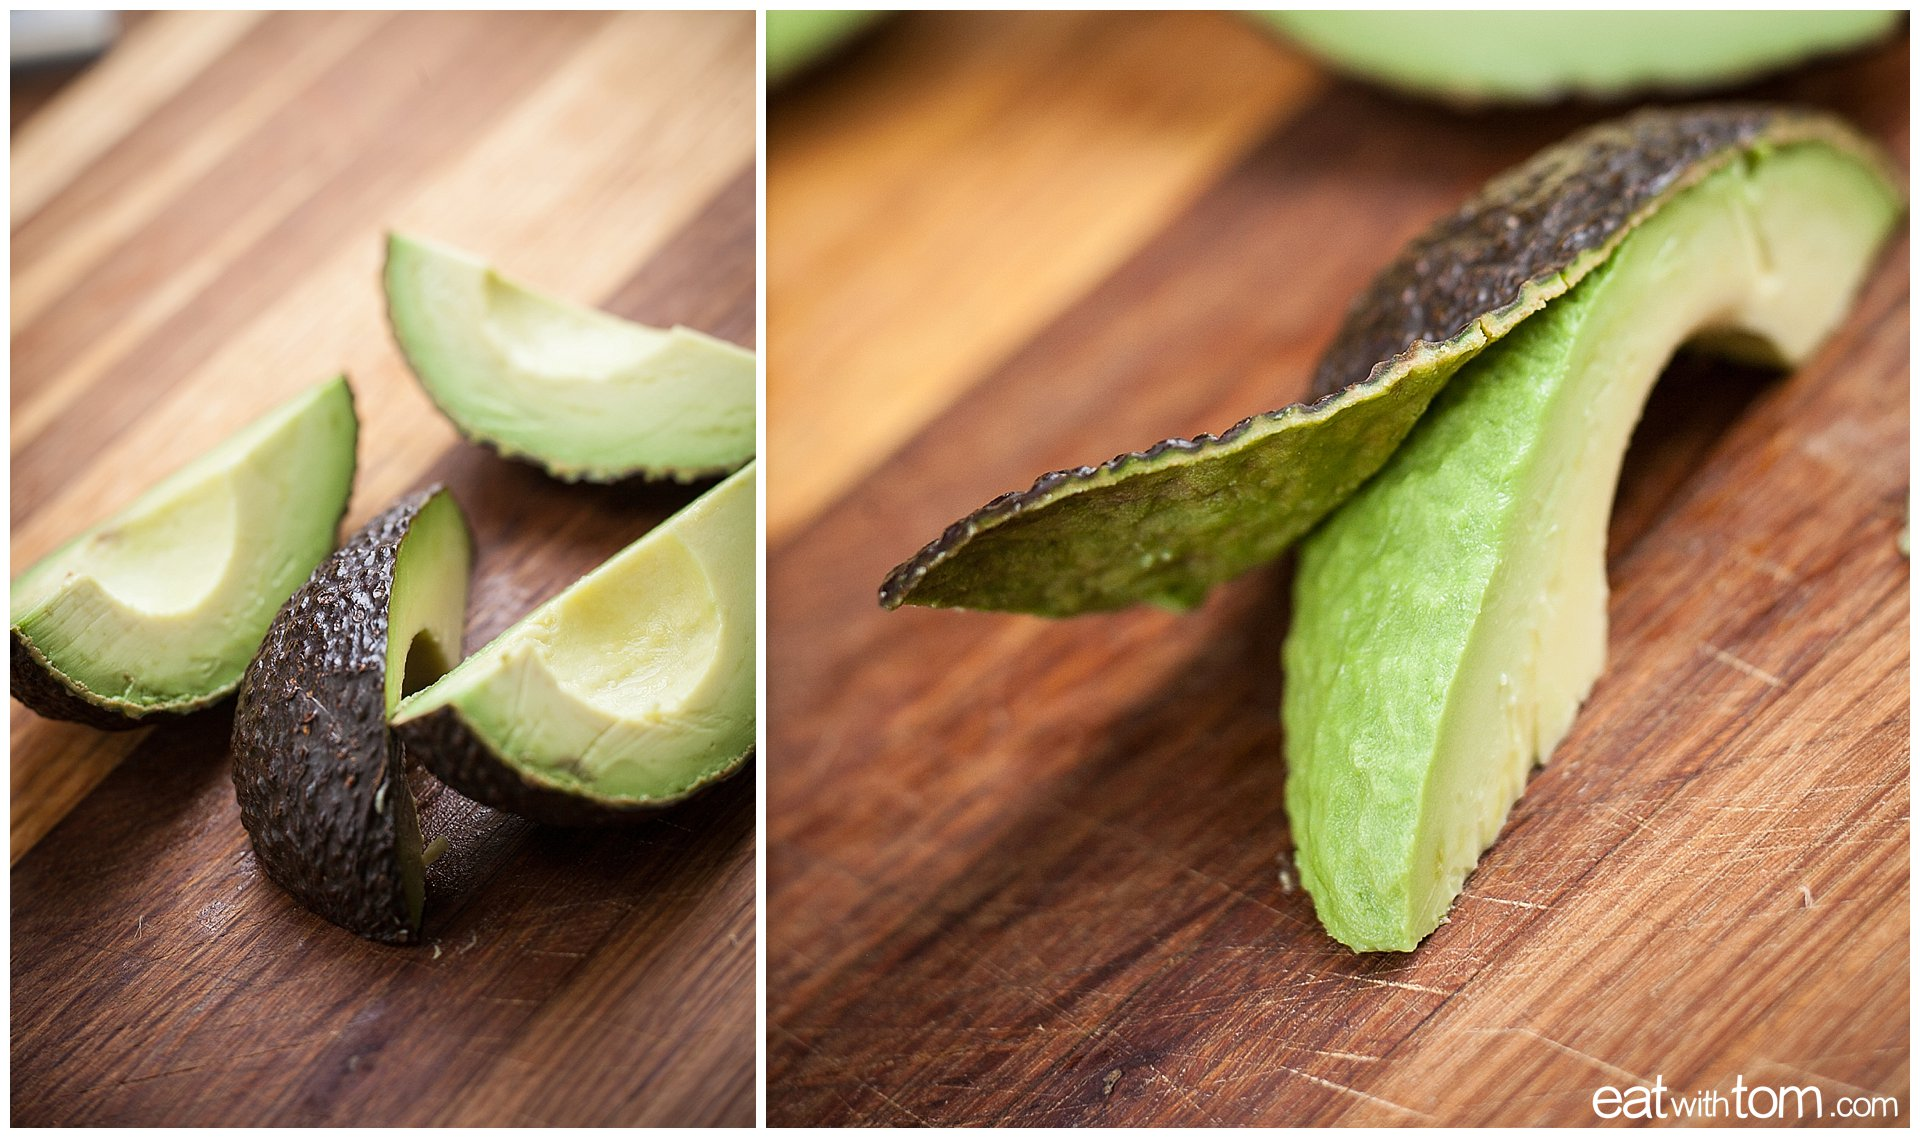 Avocado Black Beans Cilantro - how to peel avocados for breakfast